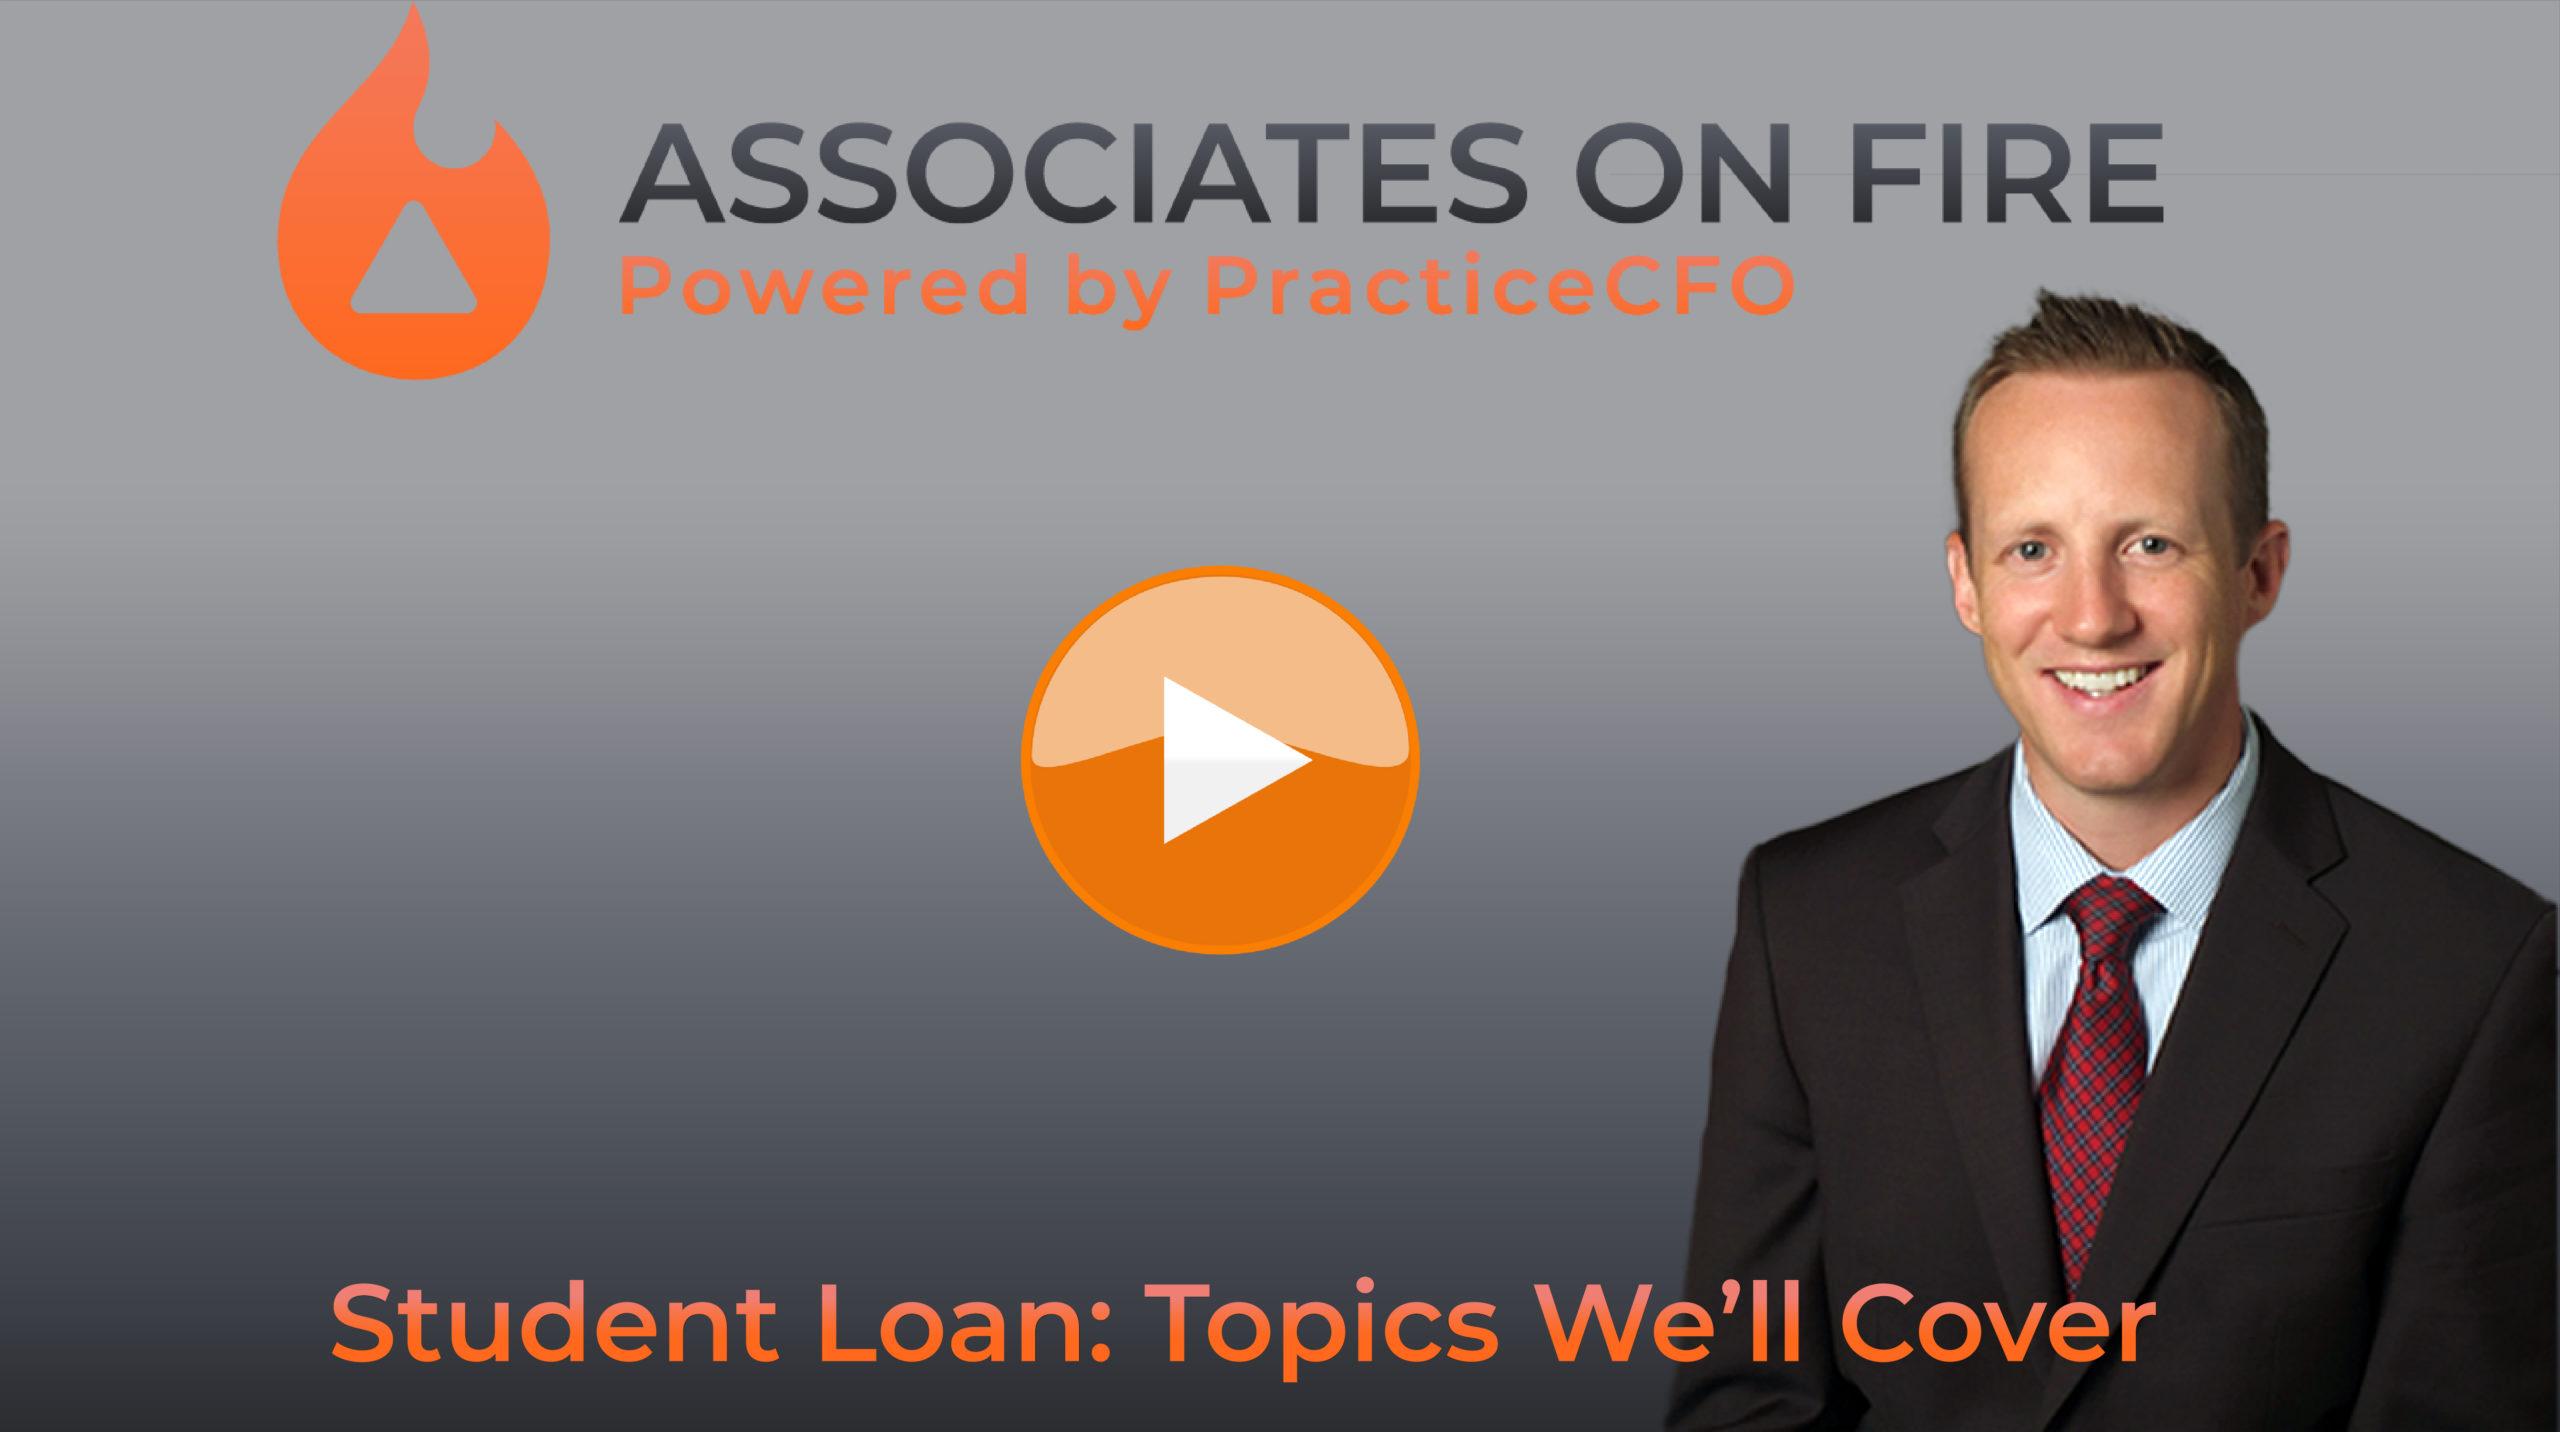 Student Loans: Topics We'll Cover